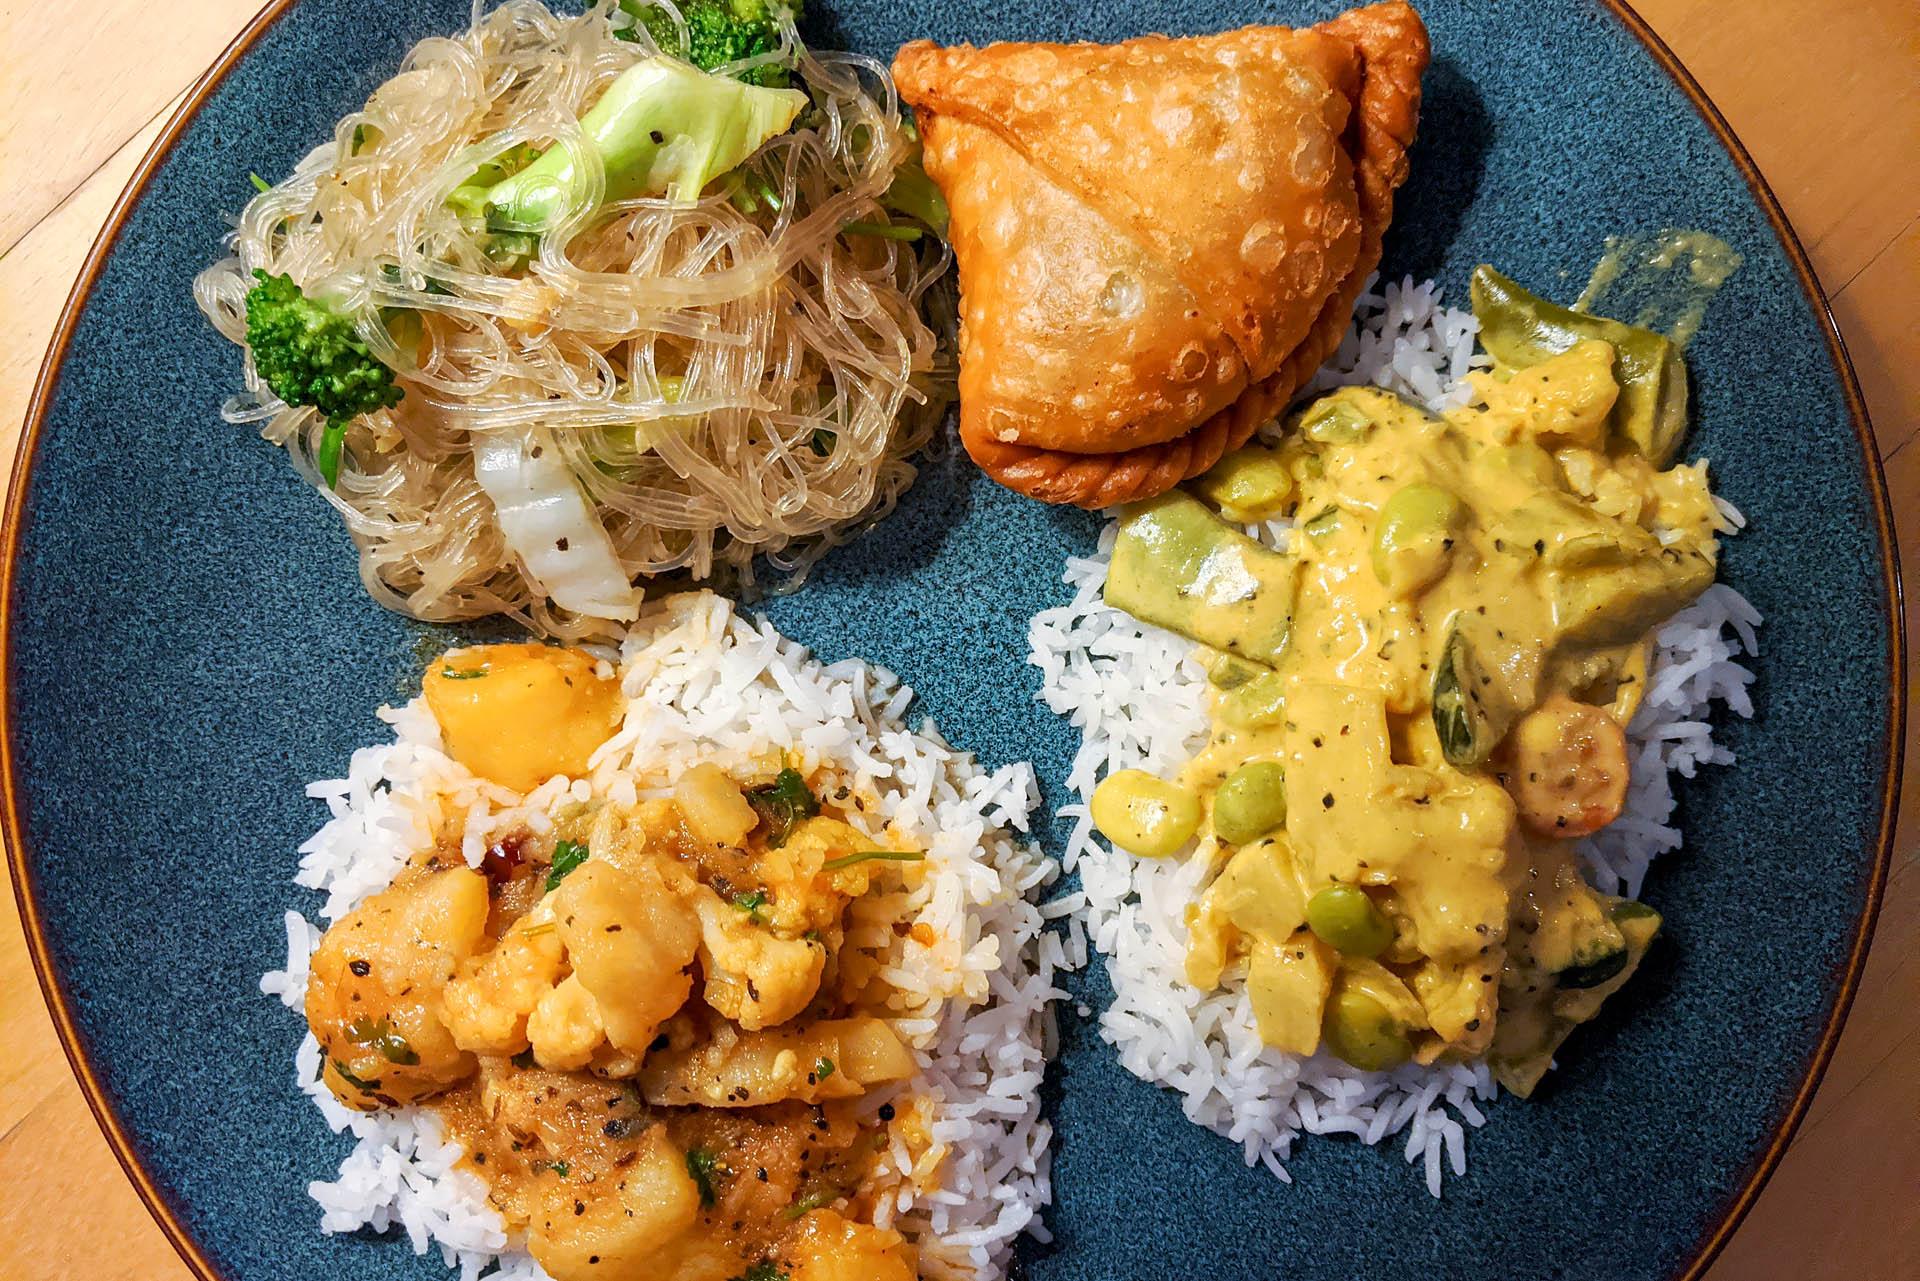 Aloo gobi, tse phing, samosa, curry